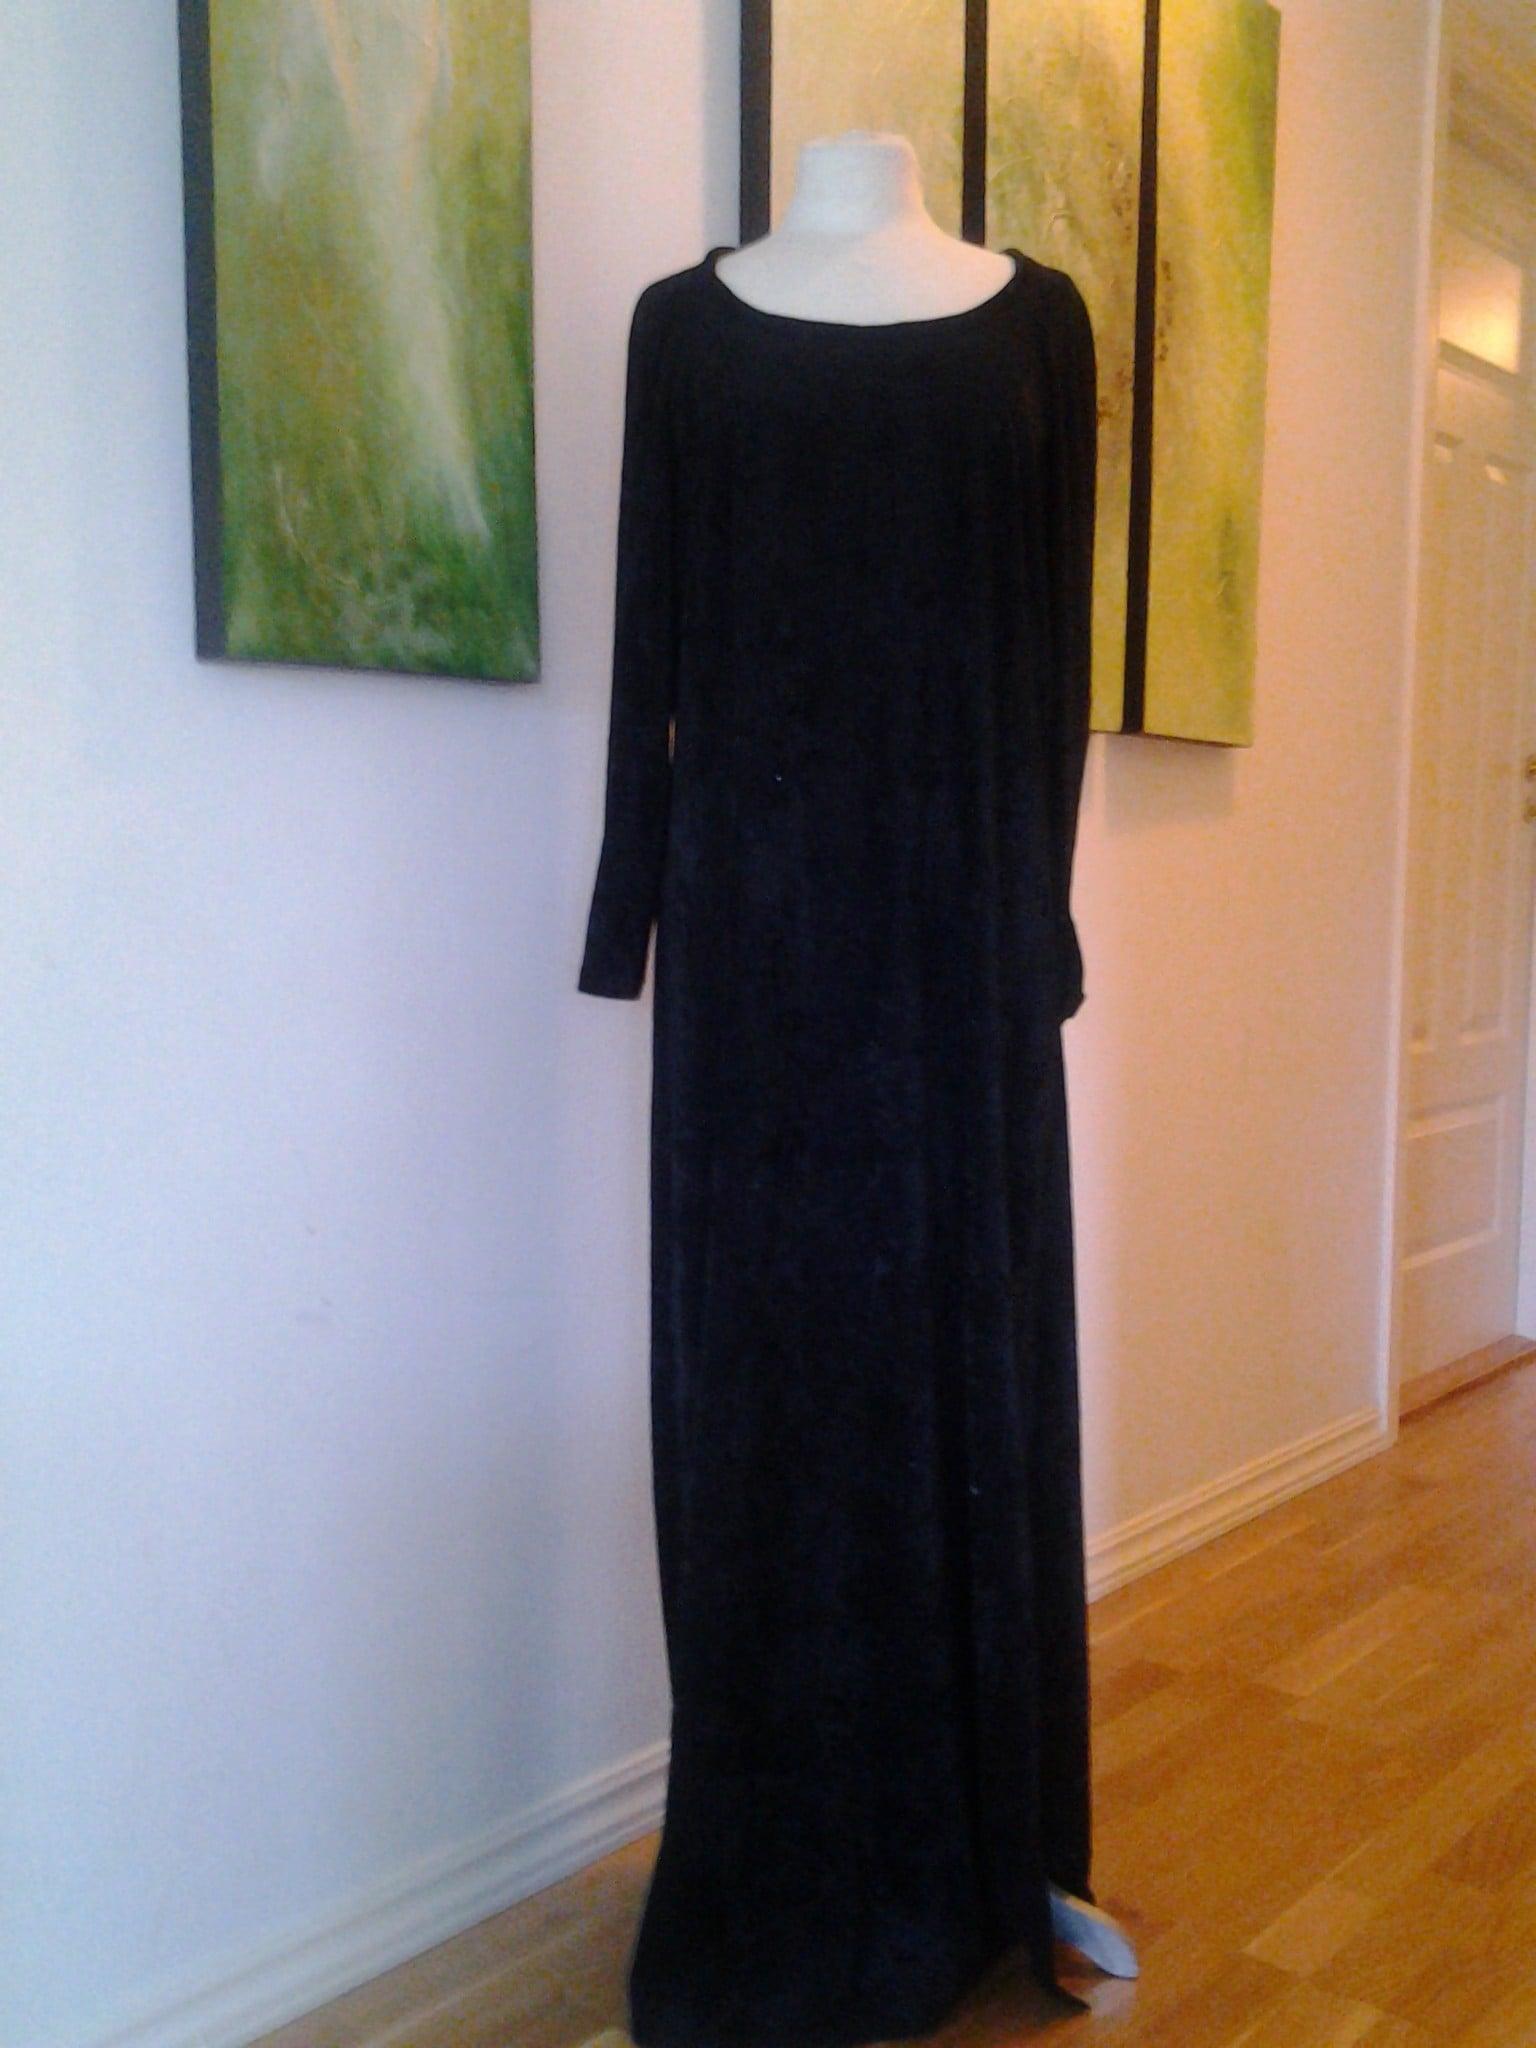 20130328 Sort lang kjole i nervøs fløyel